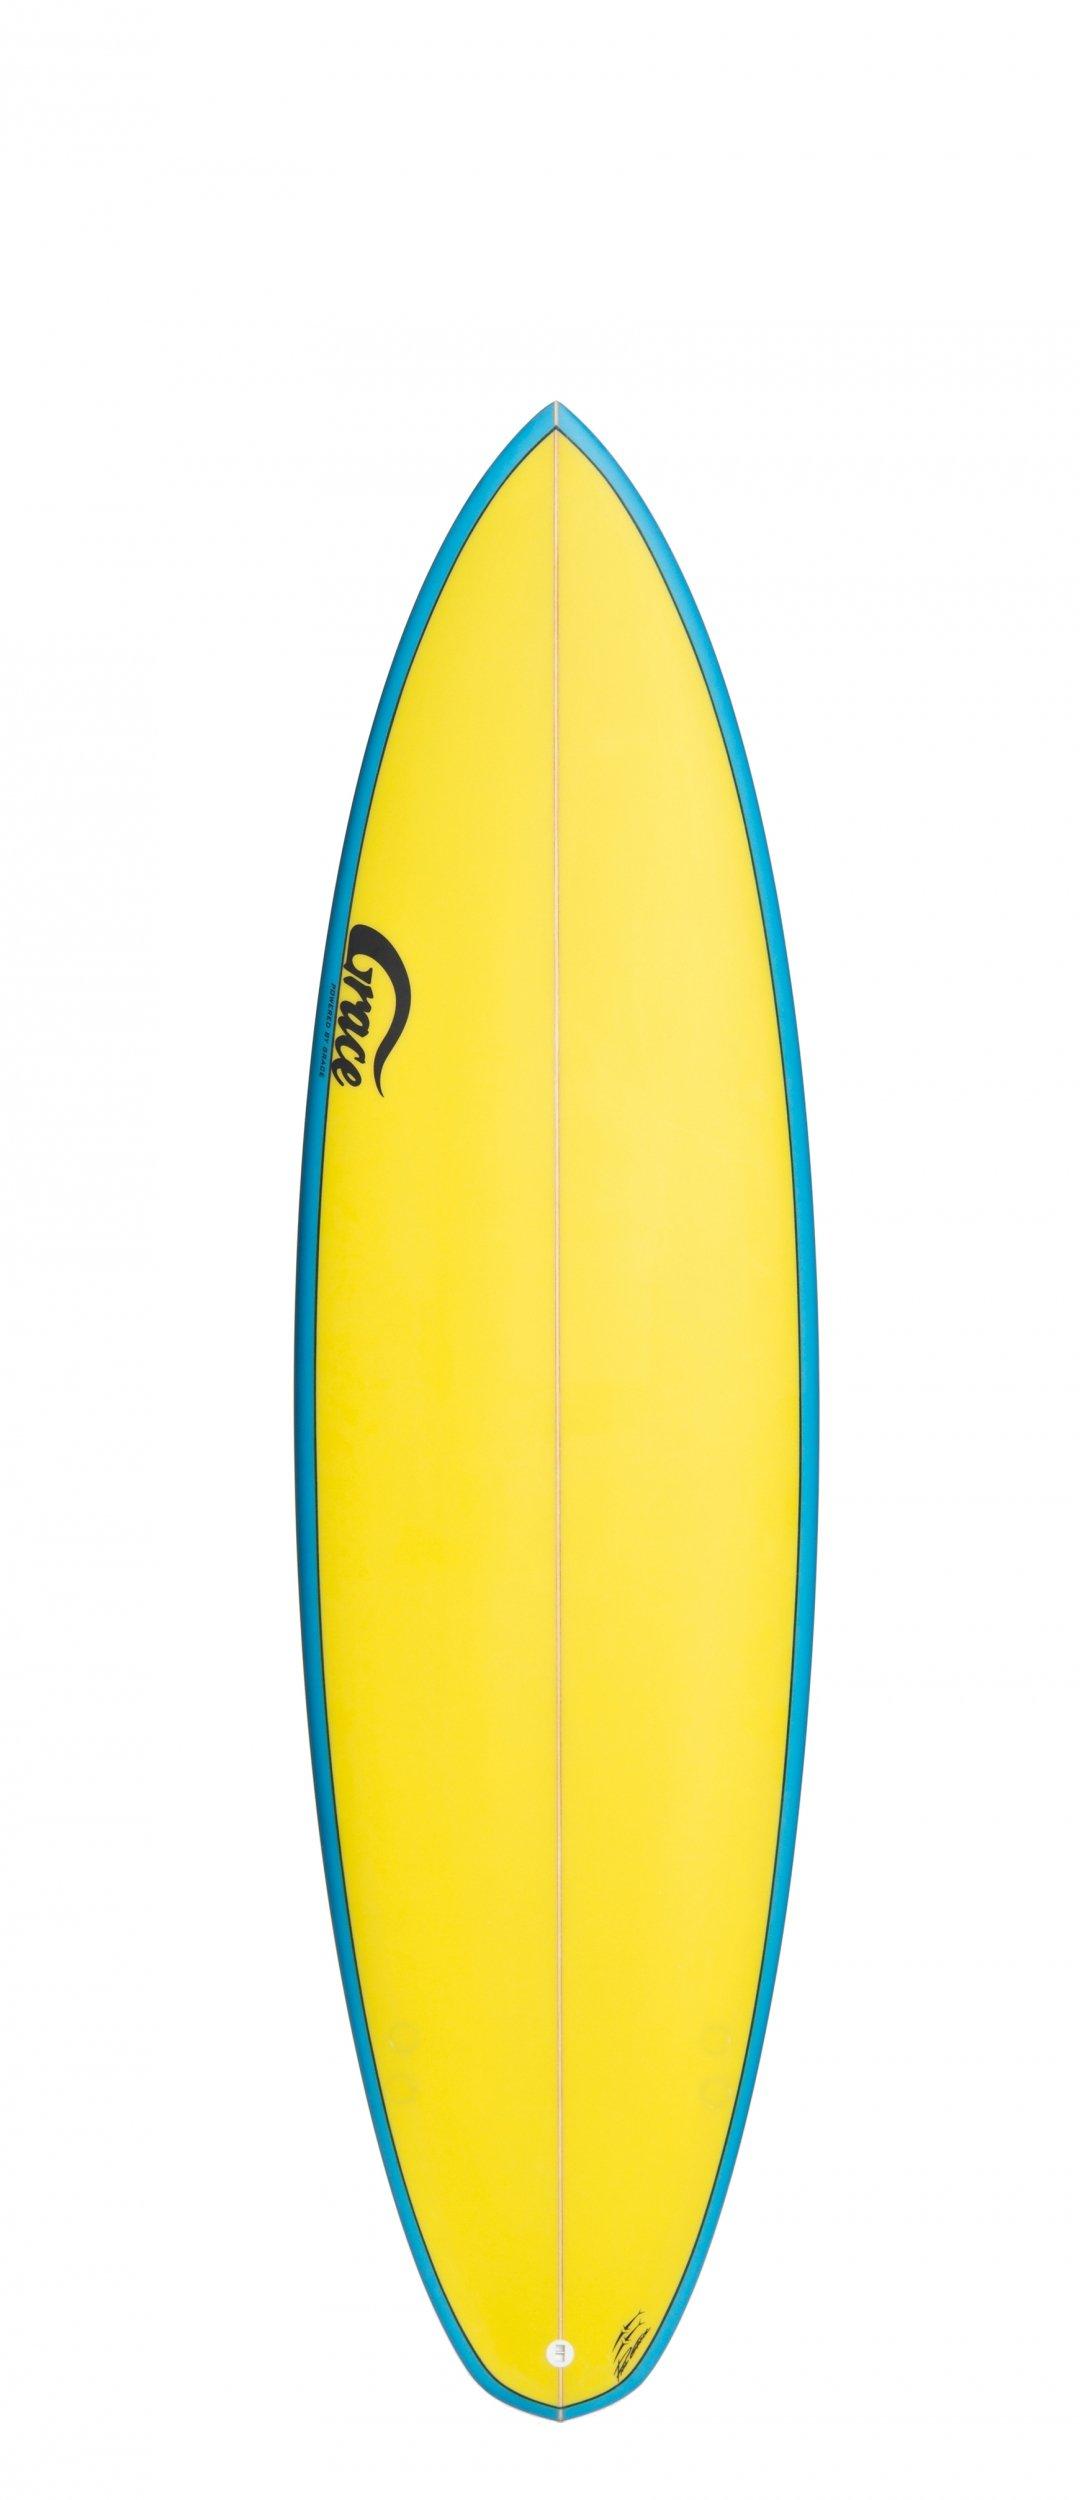 http://content.quiksilver.com/www/2014.quiksilver.com/html/upload/surf/surfboards/__id-69--9-bigboy_front.jpg Quiksilver Surfboards